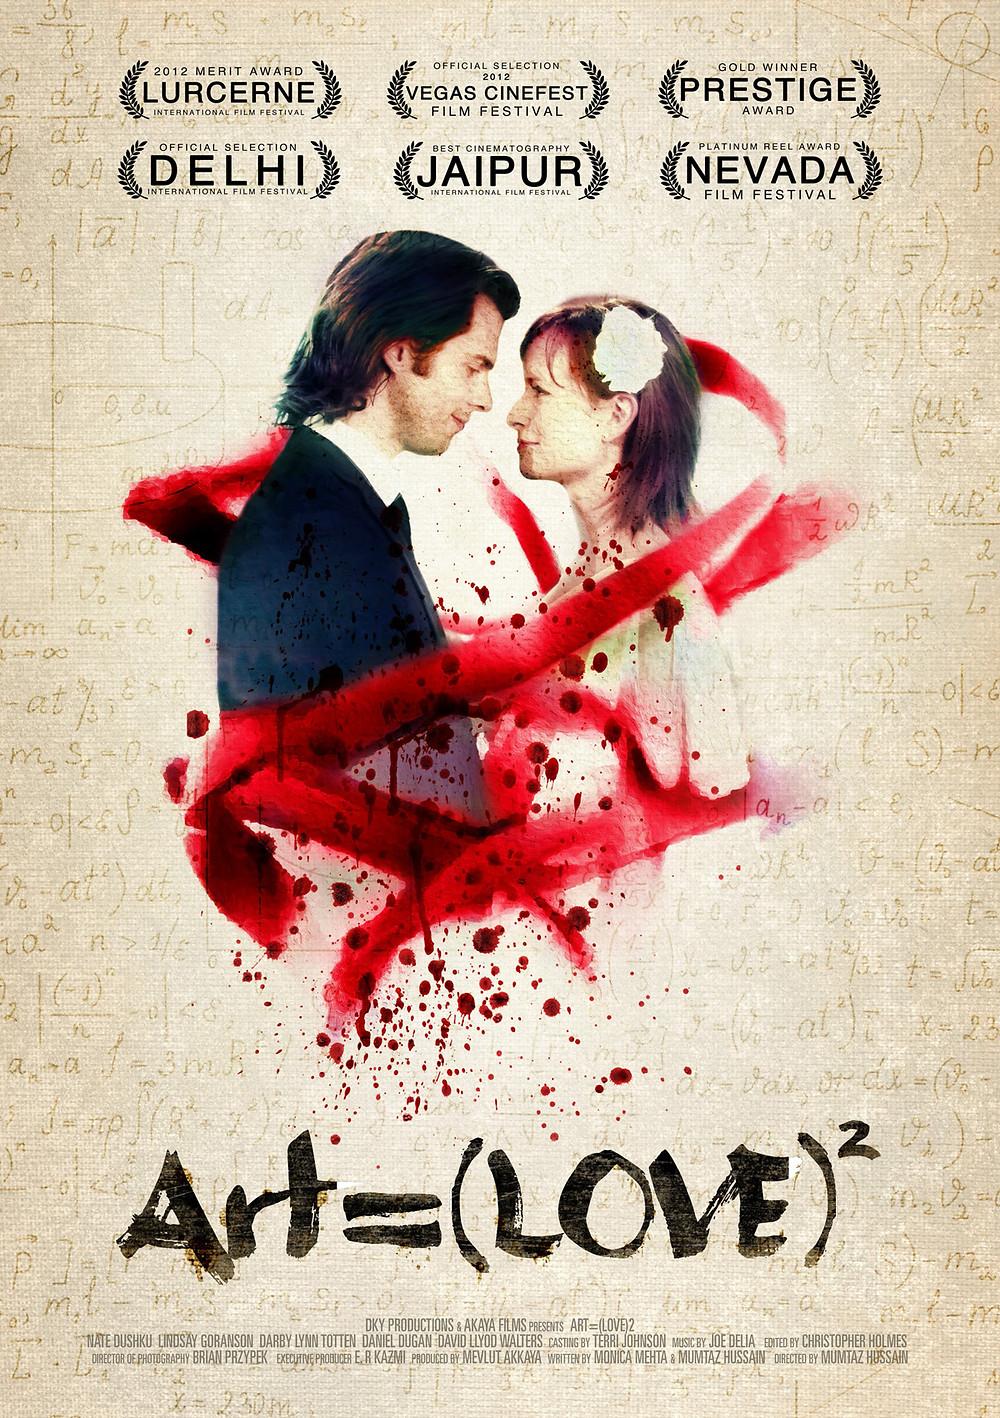 ART=LOVE2_ONE_SHEET_V0a.jpg